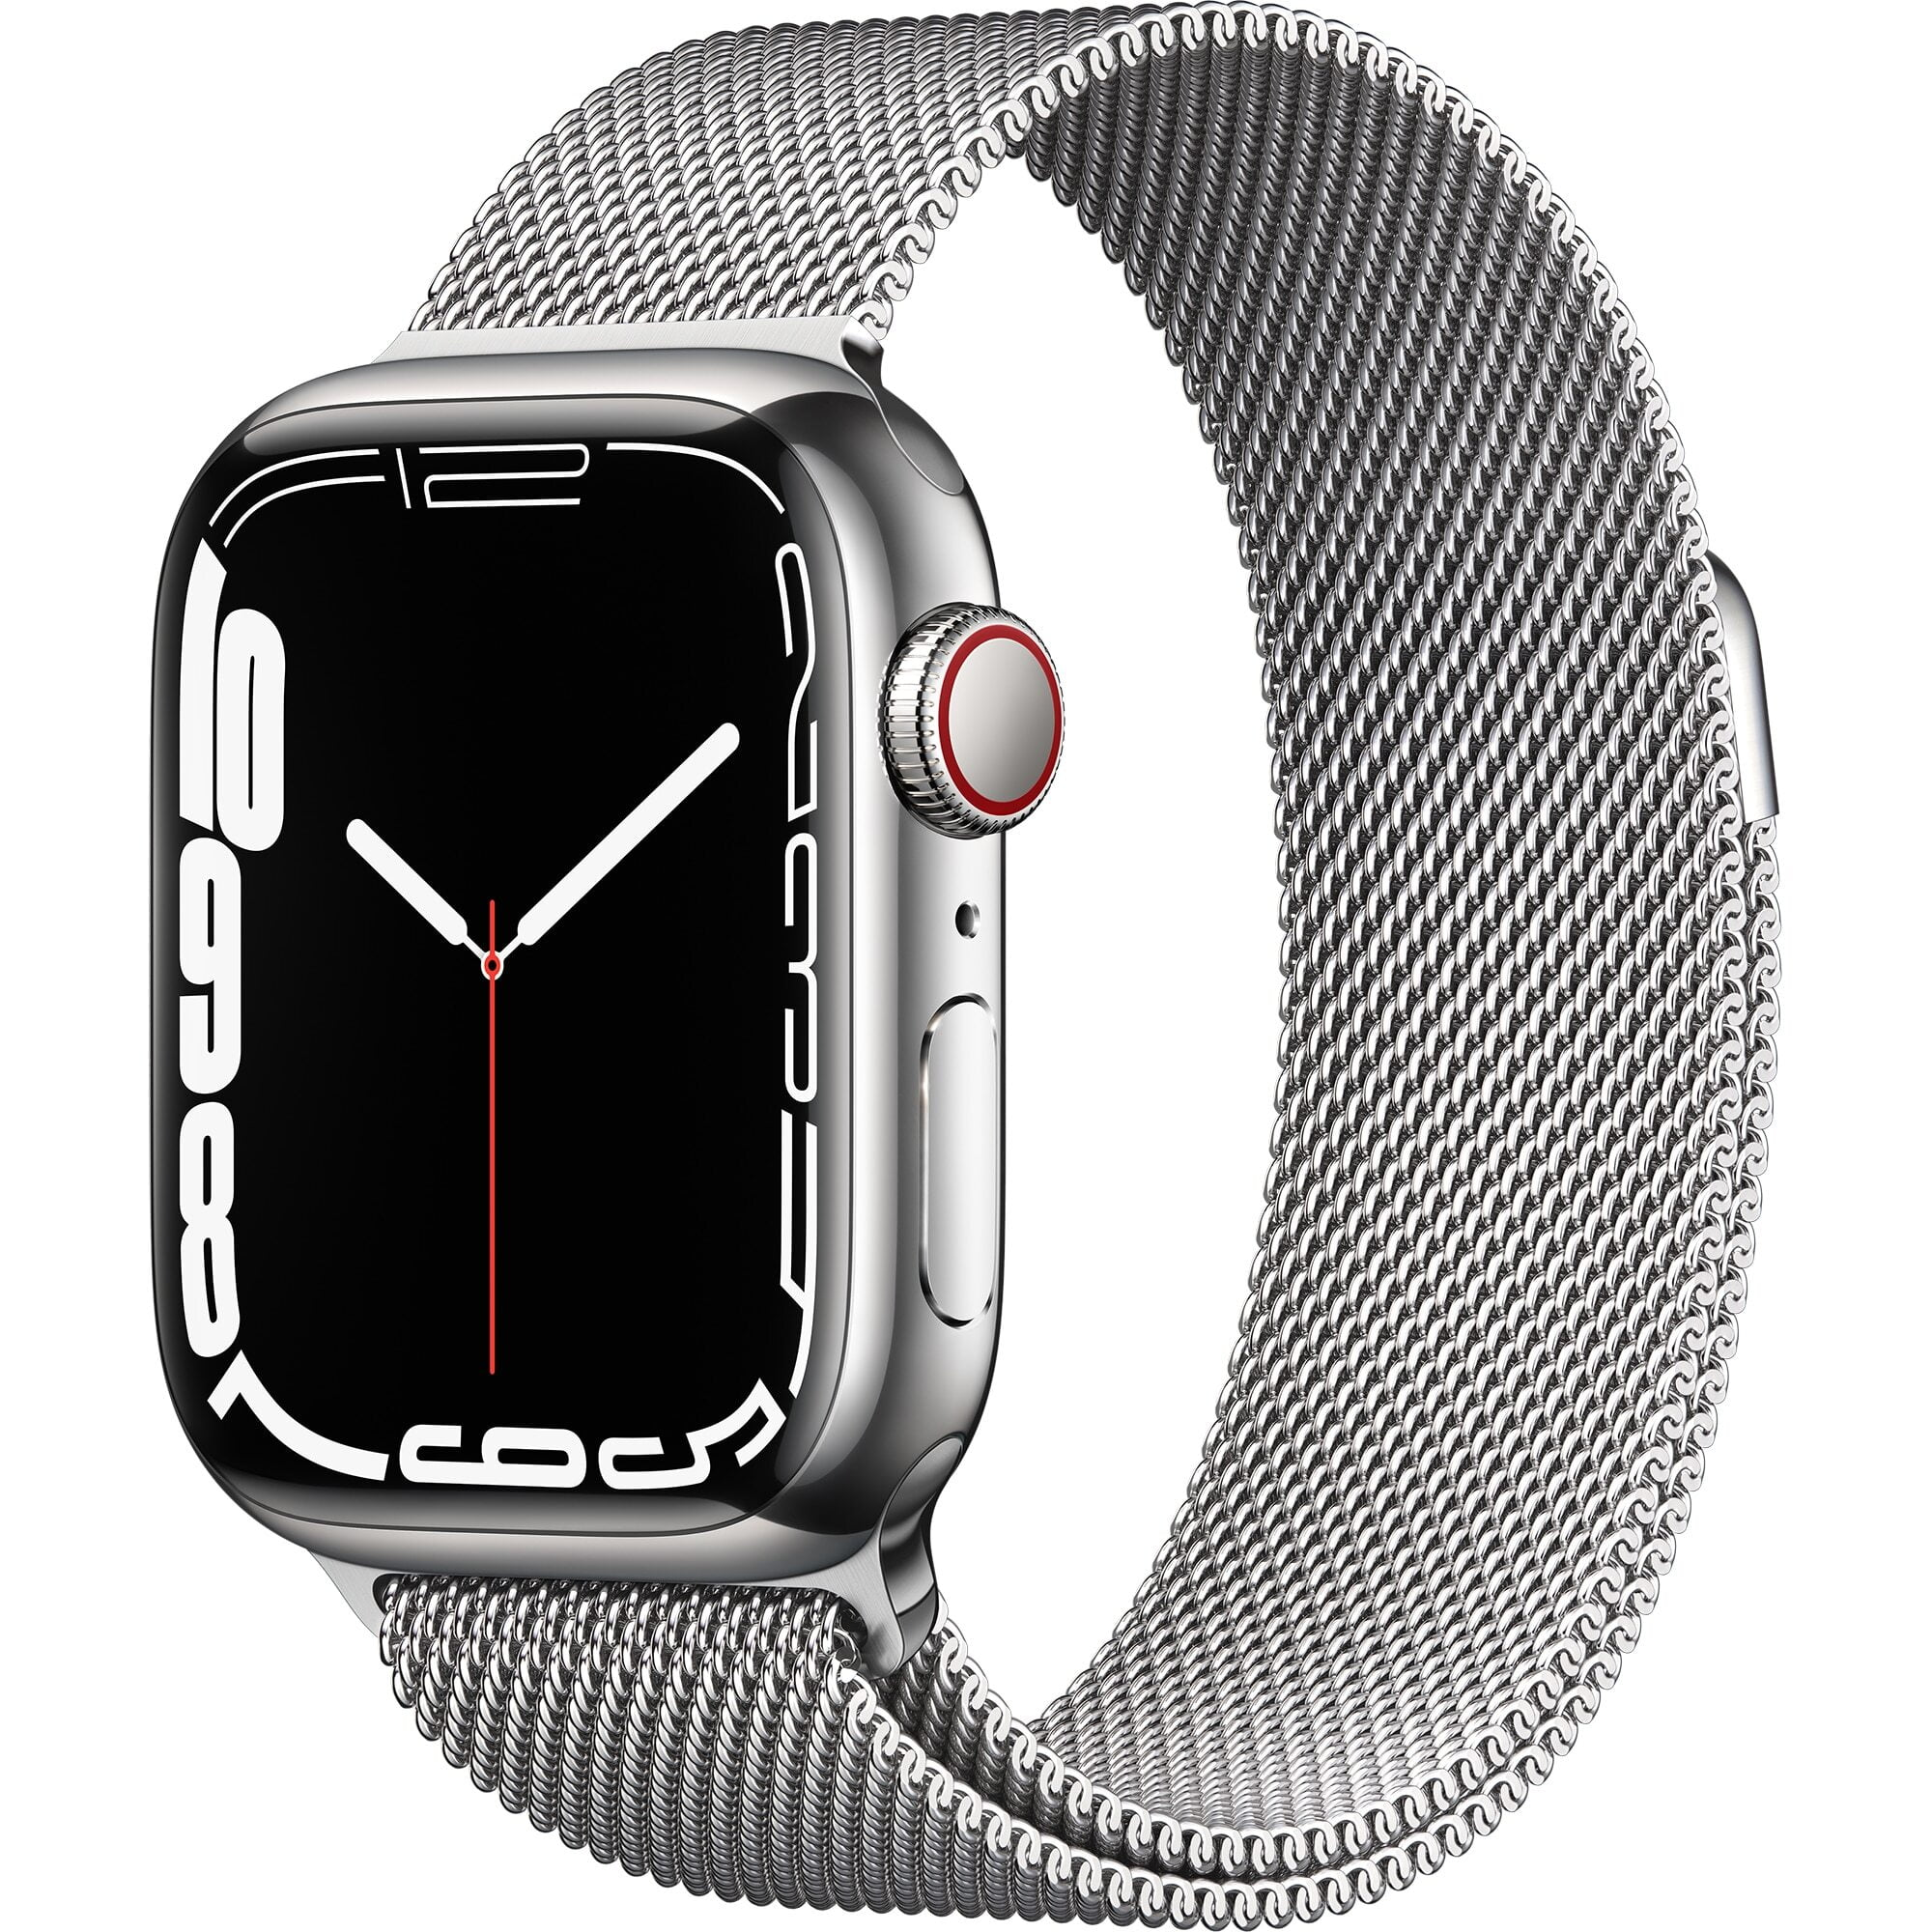 Ceas Smartwatch Apple Watch Series 7, GPS + Cellular, 41mm Silver Stainless Steel Case, Silver Milanese Loop